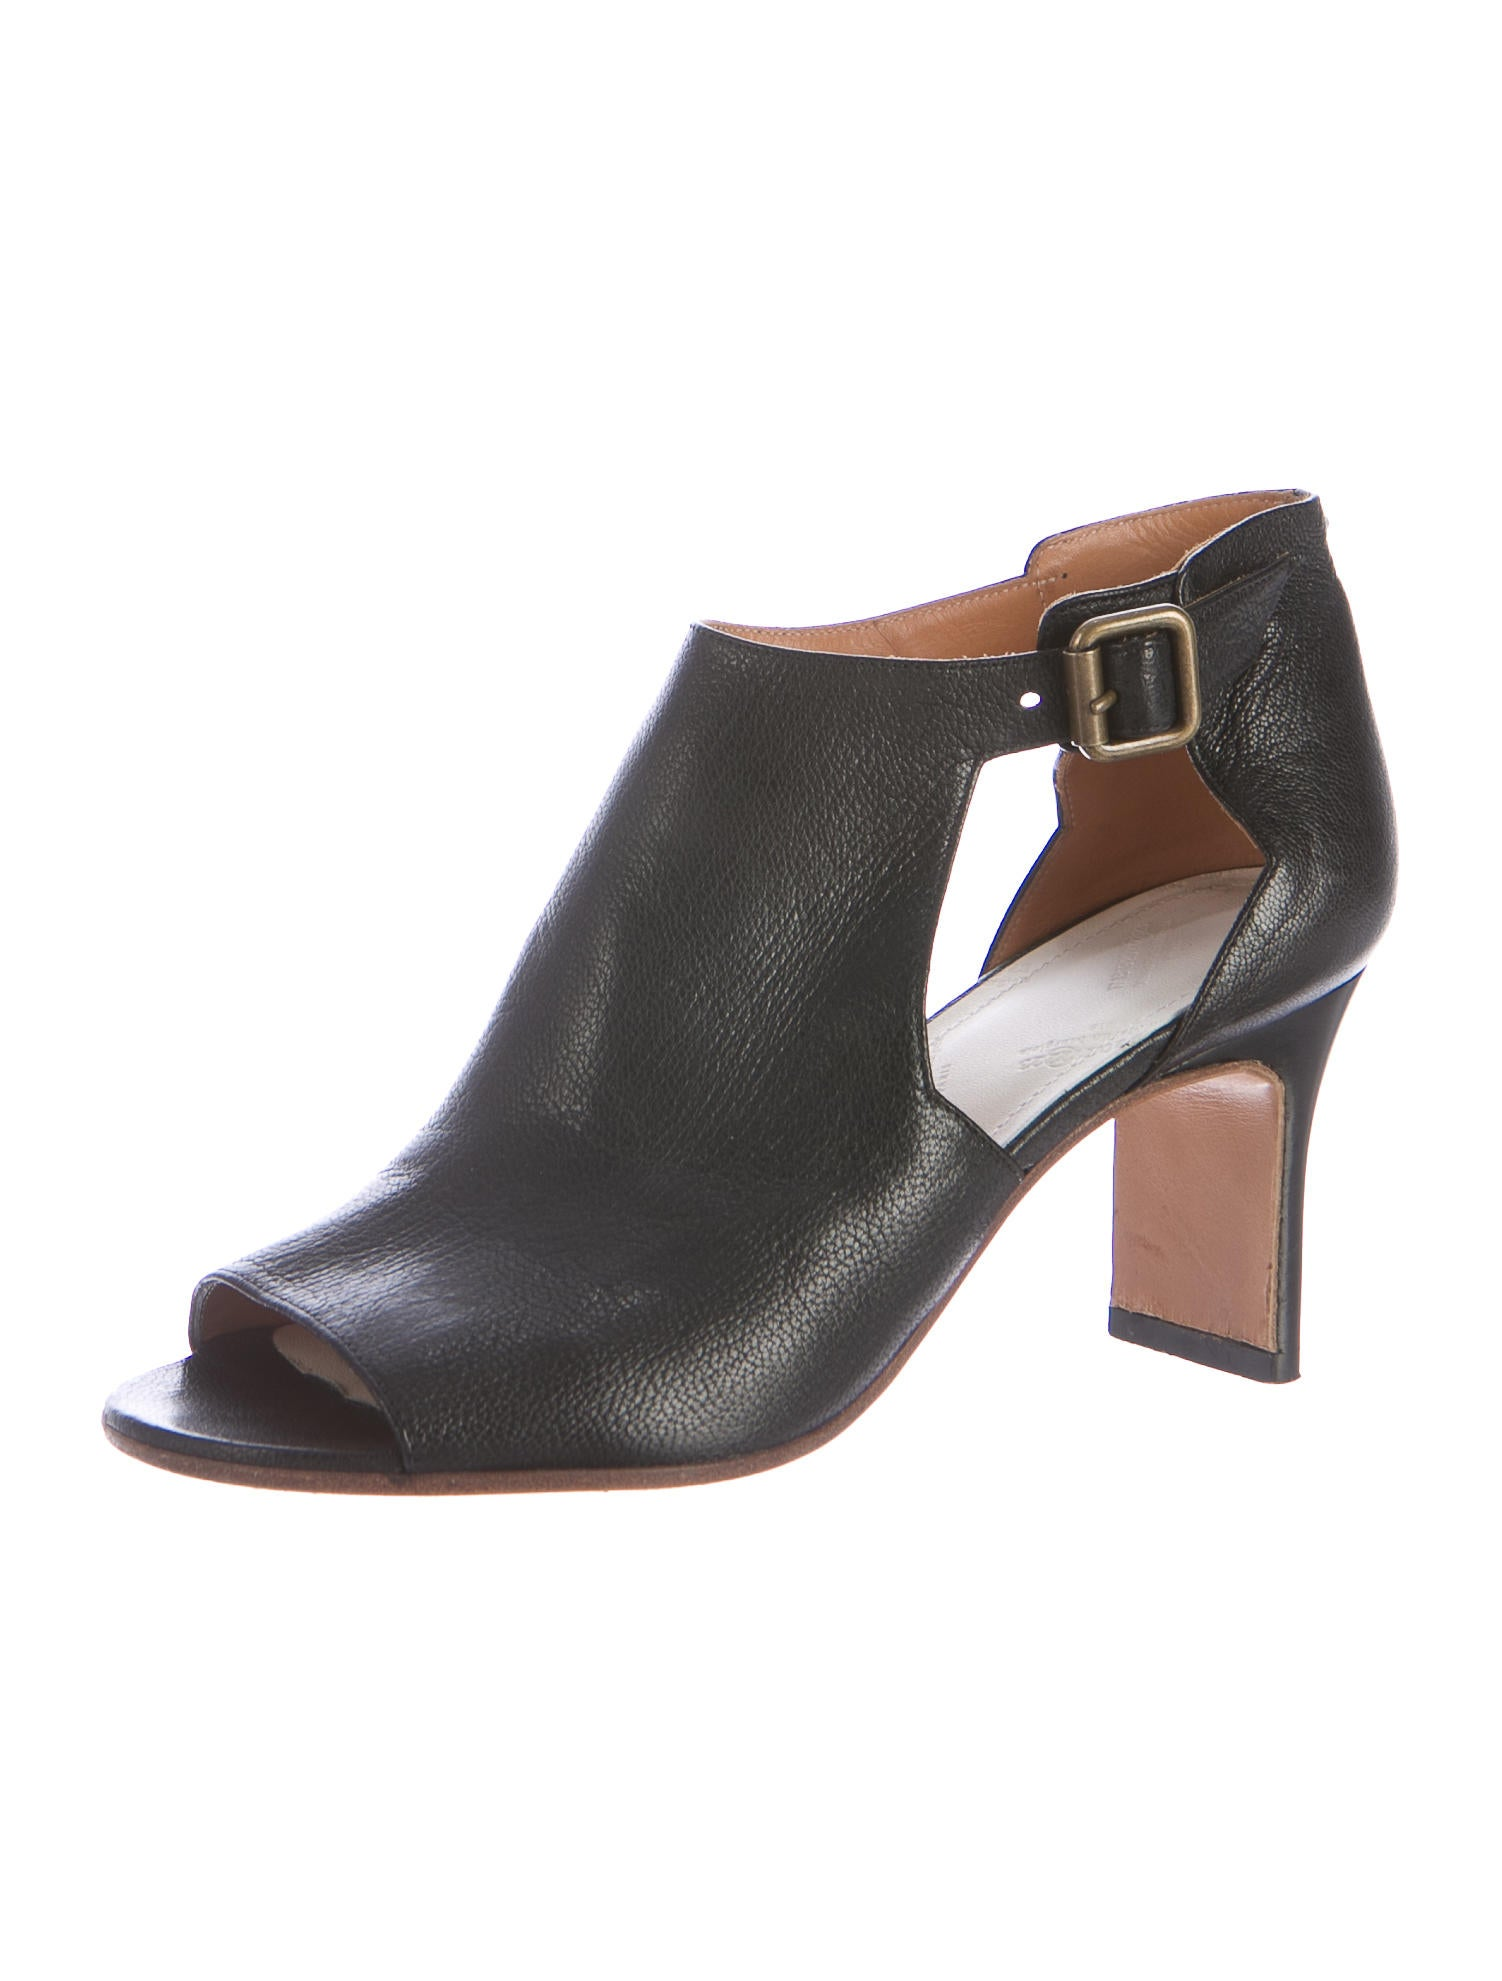 maison martin margiela cutout leather booties shoes. Black Bedroom Furniture Sets. Home Design Ideas